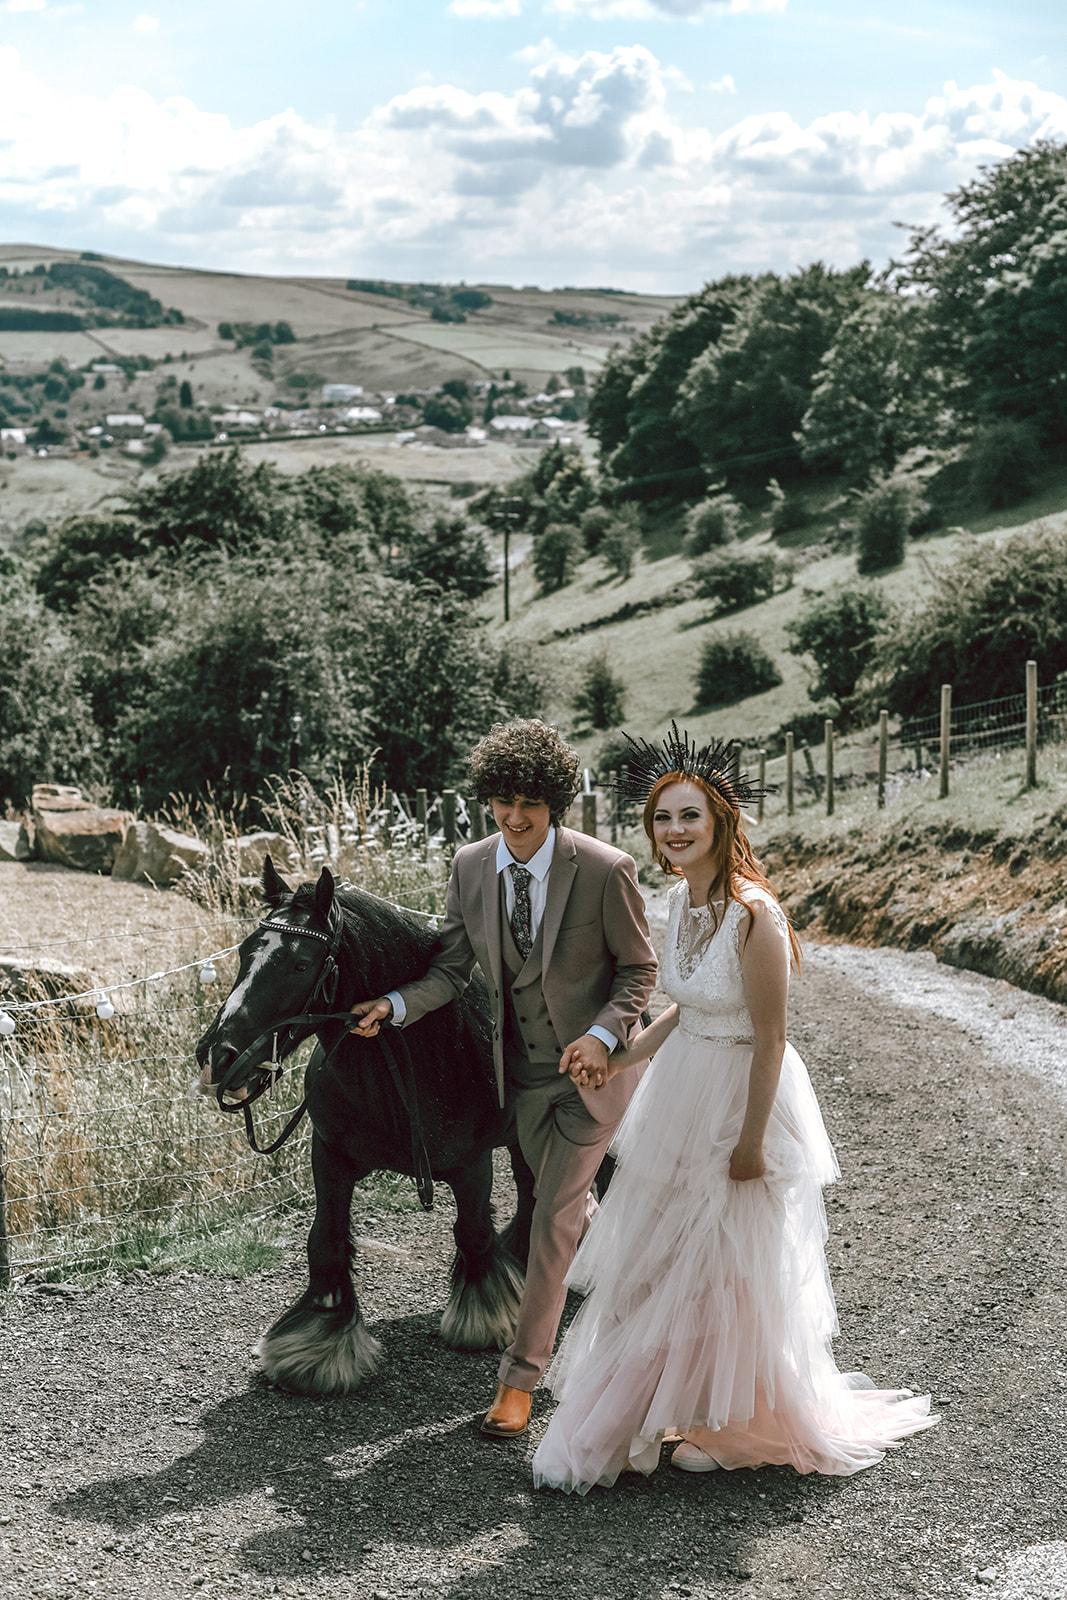 rustic festival wedding - farm wedding - bride and groom with horse